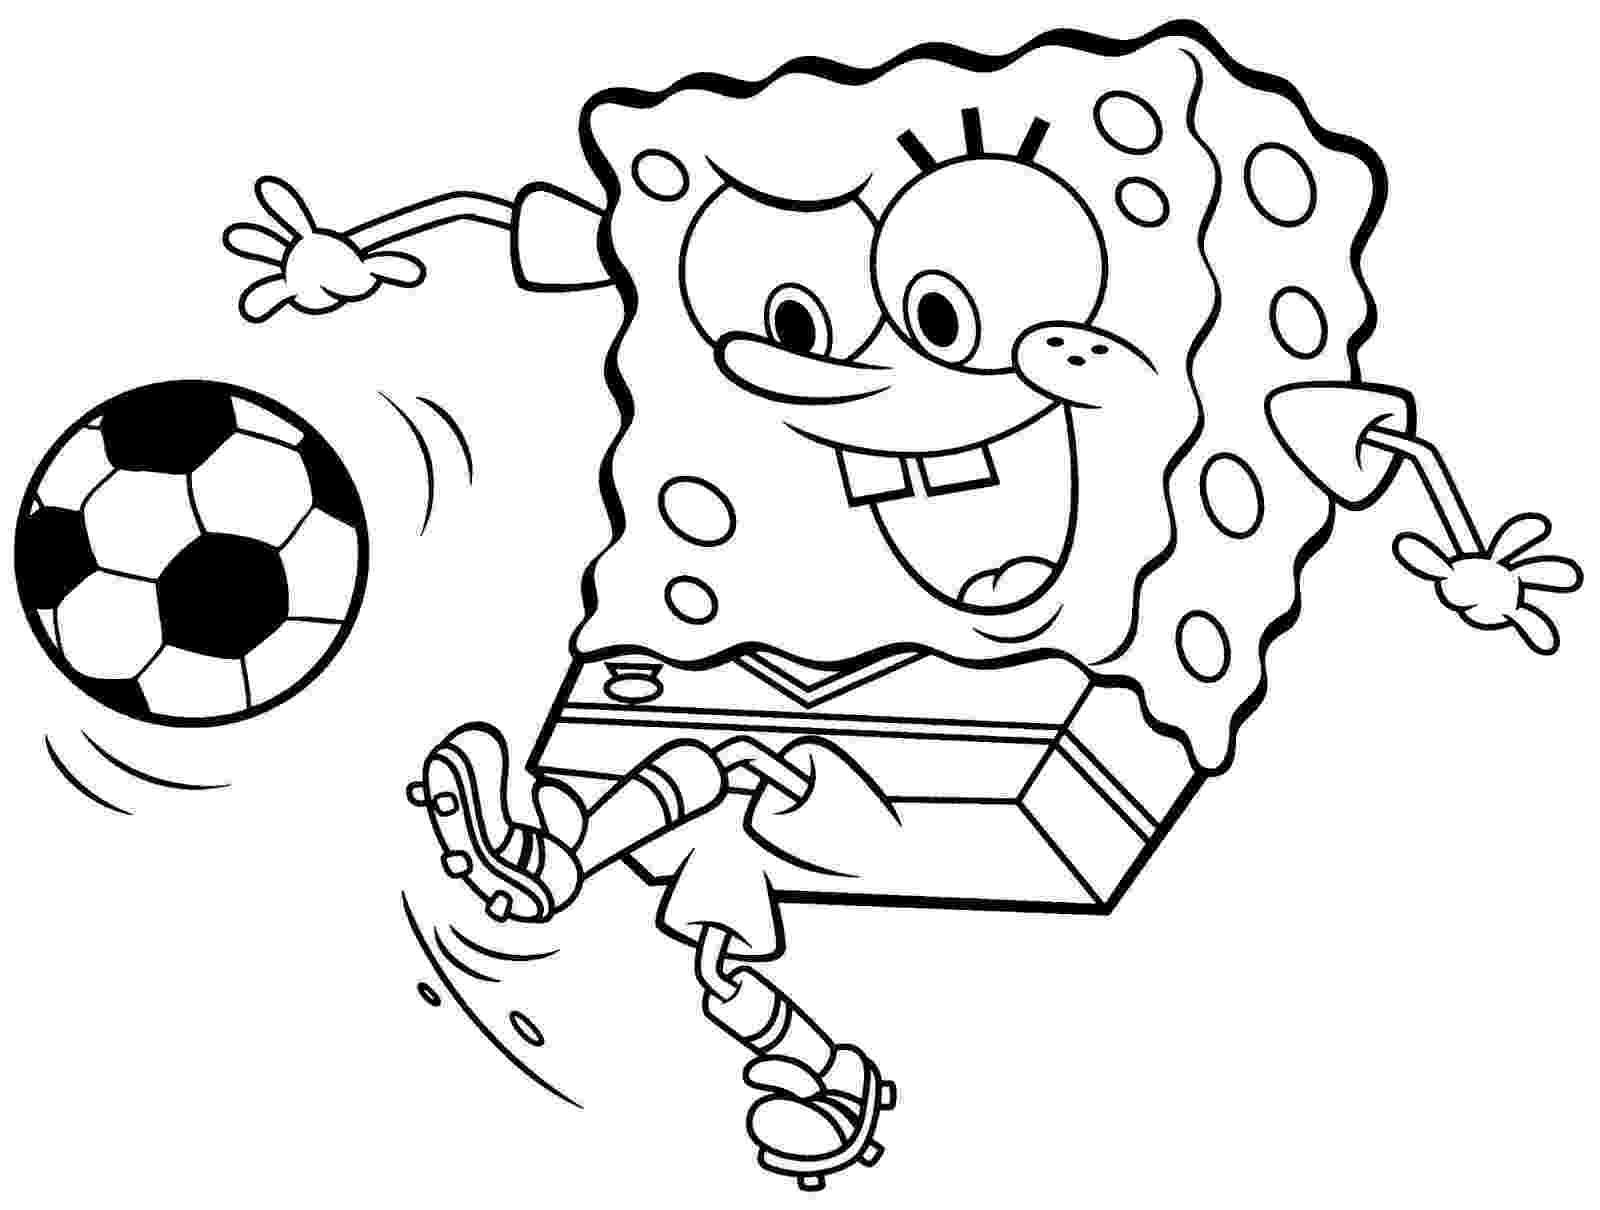 spongebob coloring book download spongebob squarepants coloring pages team colors download book coloring spongebob